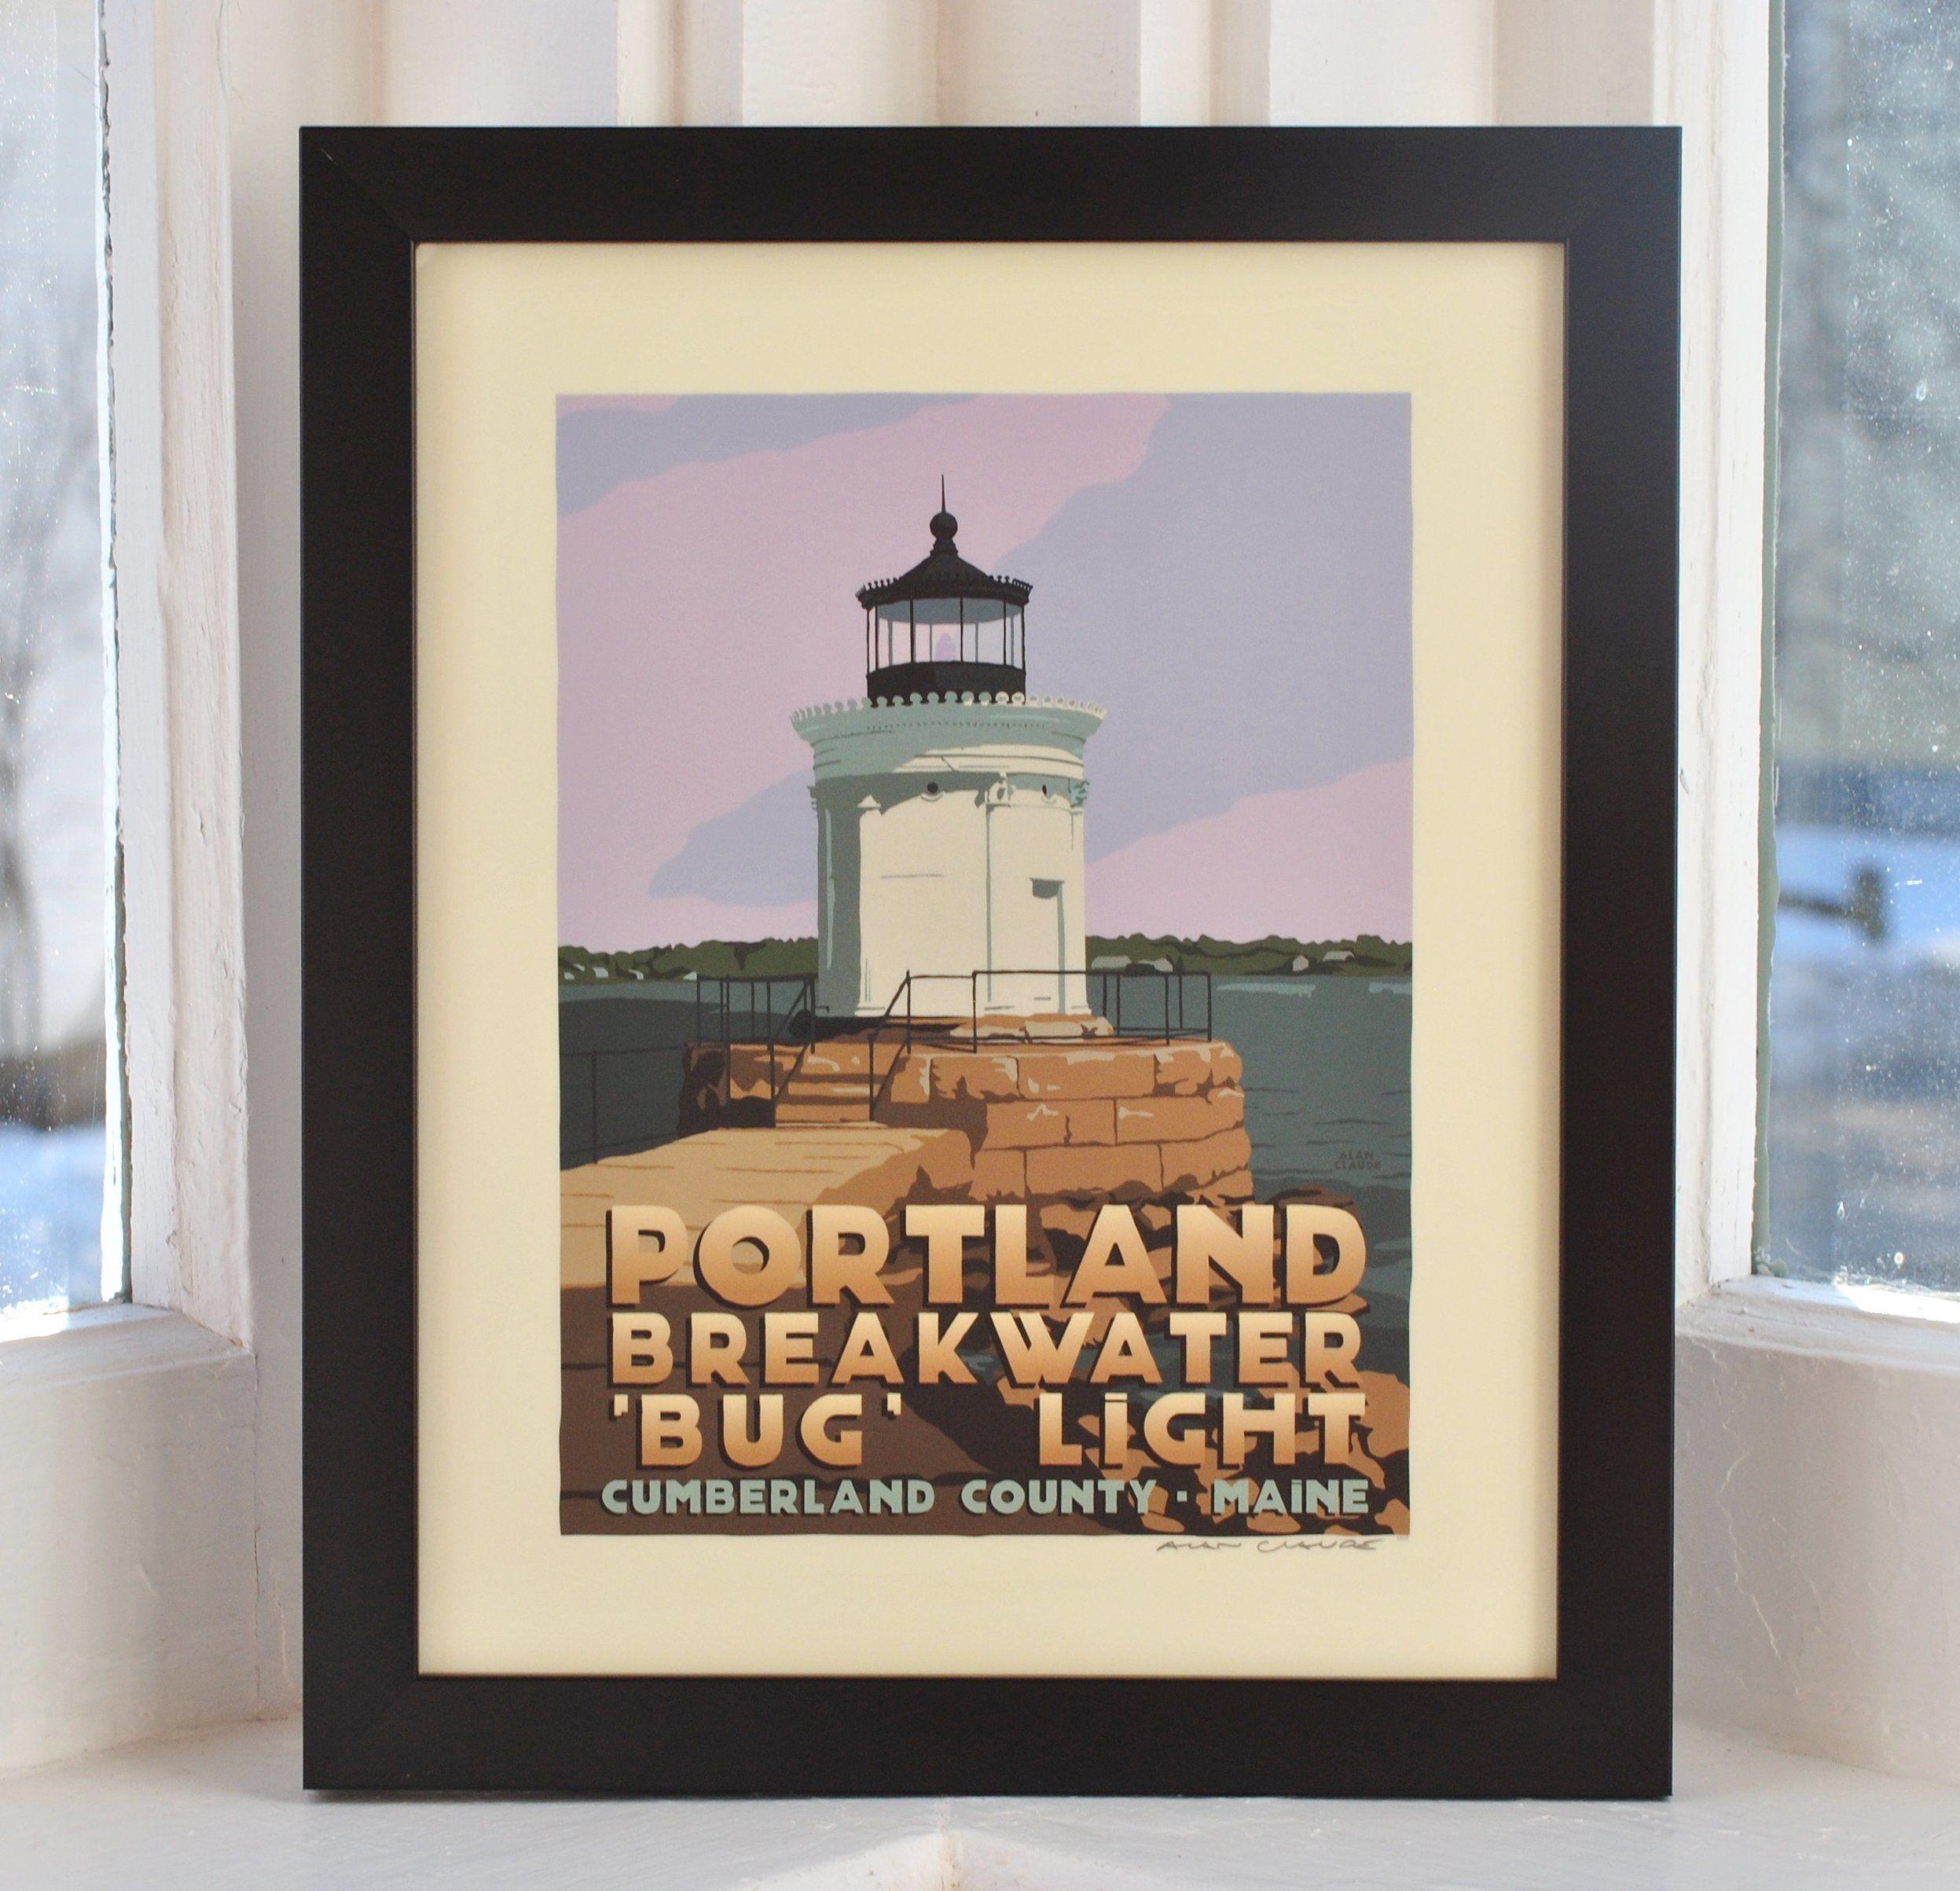 Lighthouse Bedroom Decor Portland Breakwater Bug Light Framed Print 8x10 Lighthouse